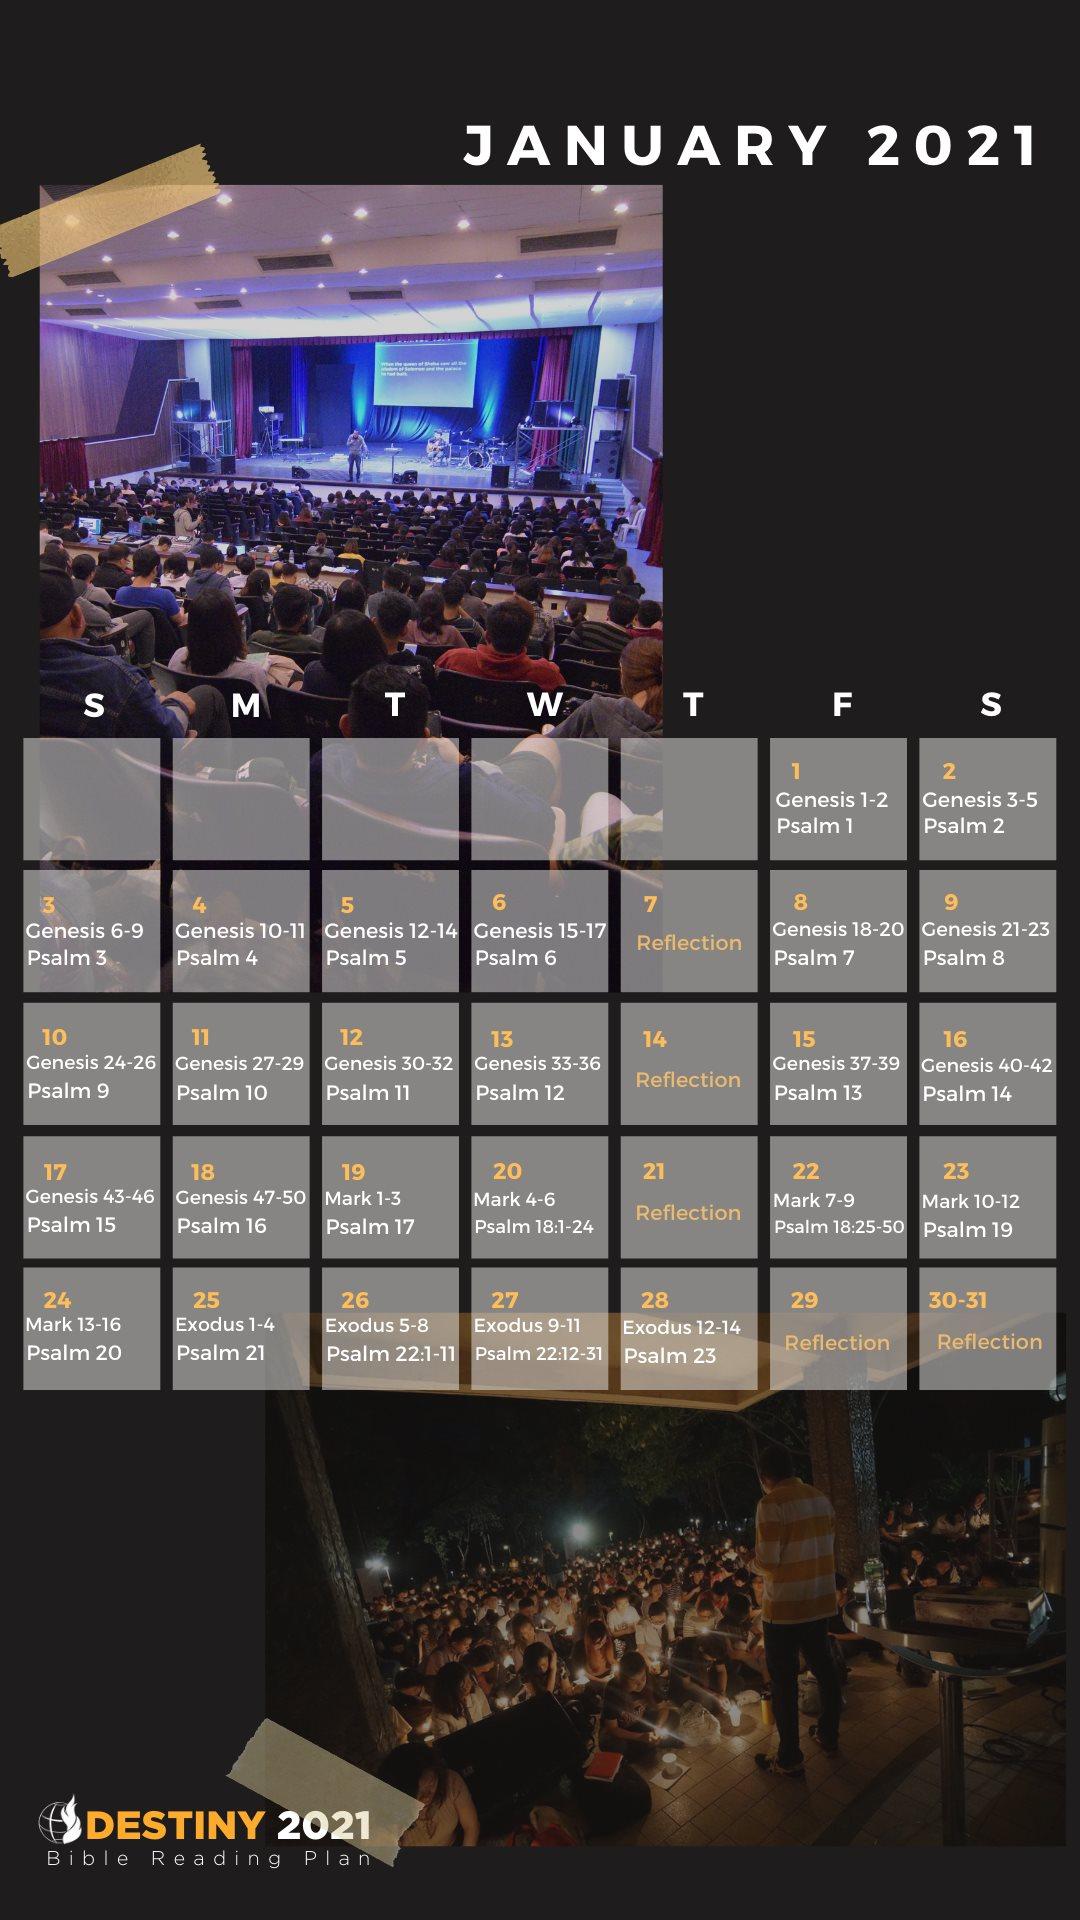 January 2021 – Bible Reading Plan